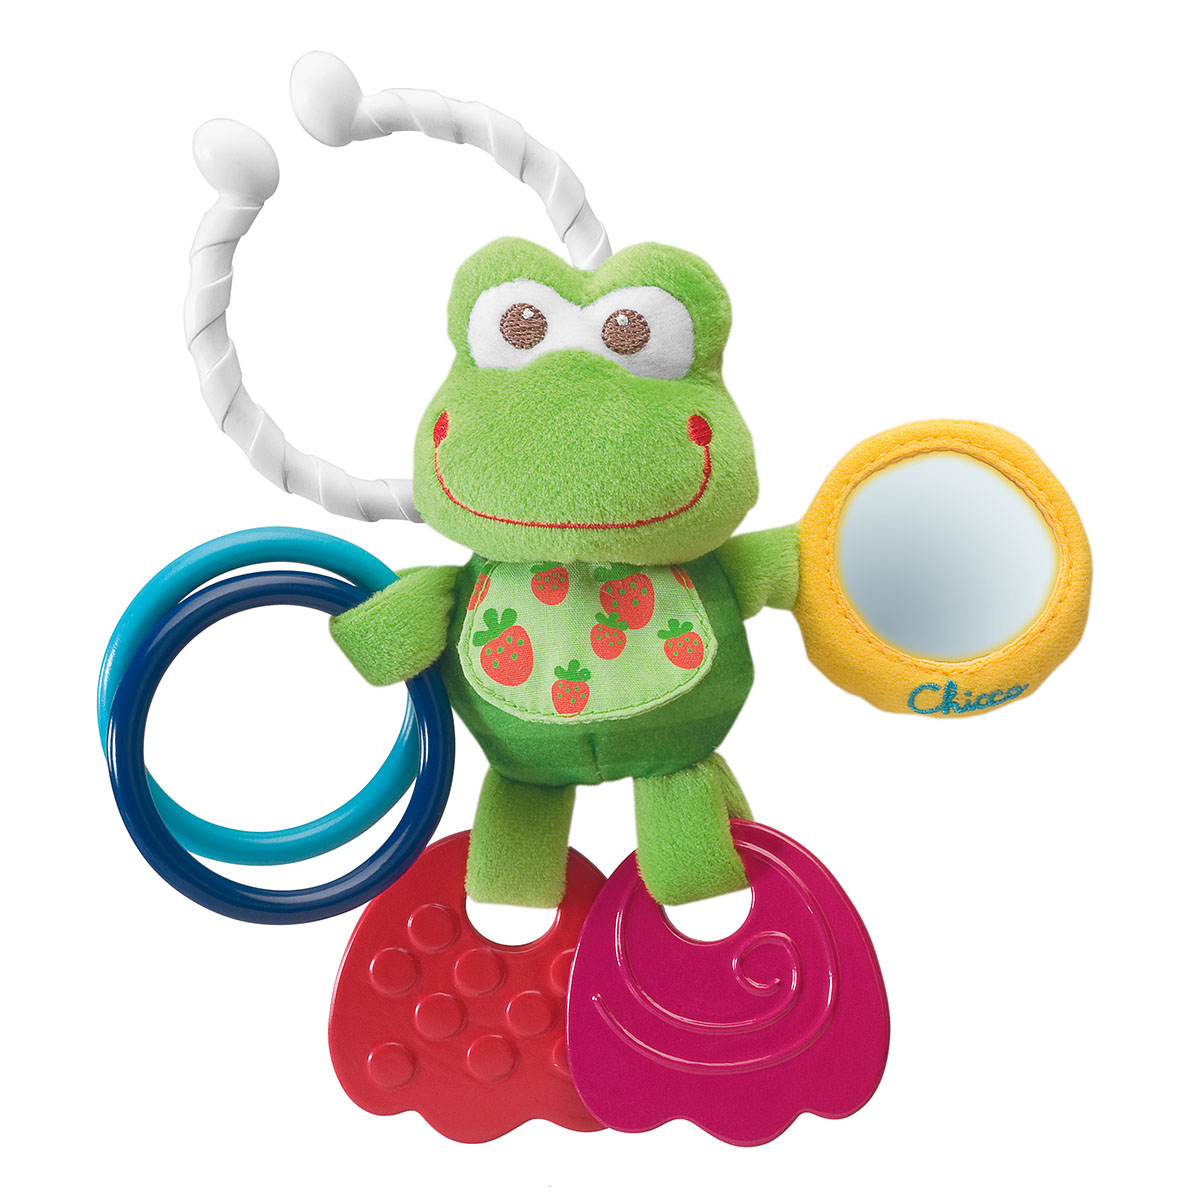 "Развивающая игрушка-подвеска Chicco ""Лягушонок"", Artsana S.p.A."